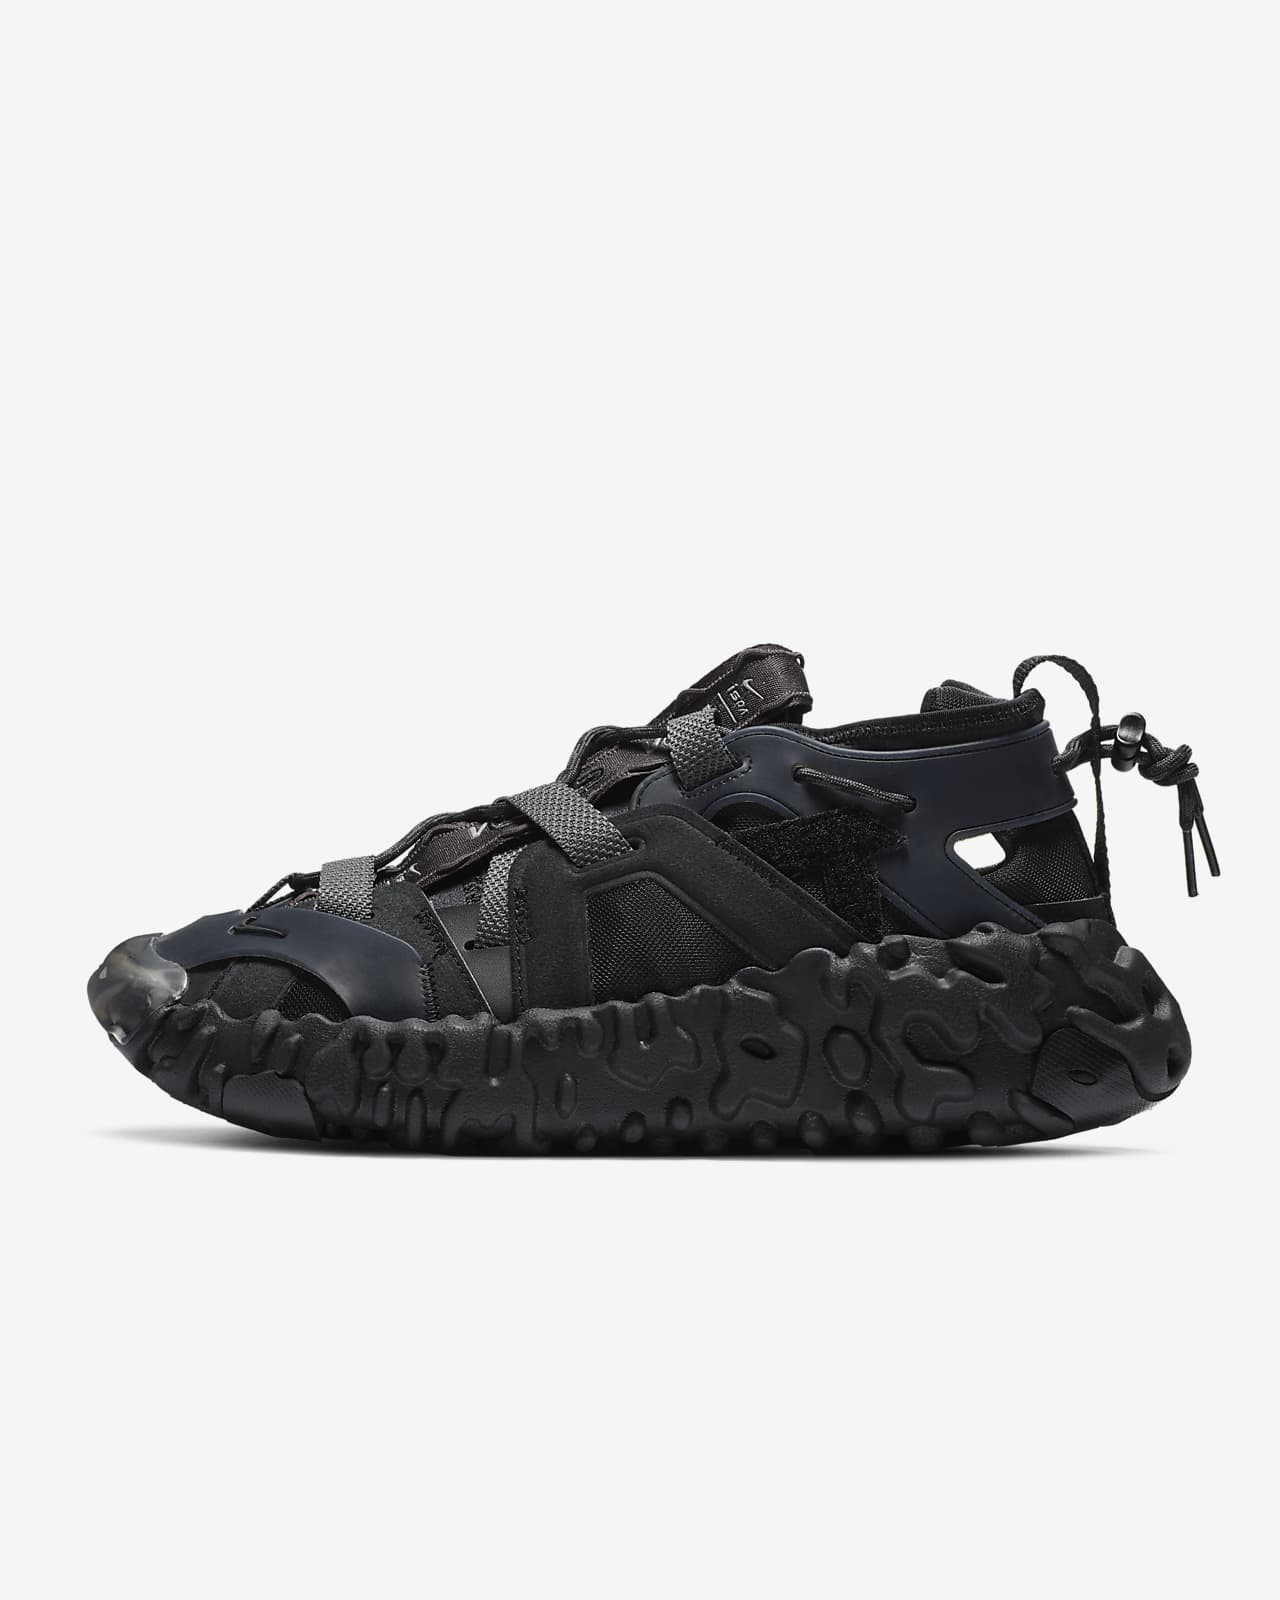 Nike OverReact Sandal ISPA 男子凉鞋